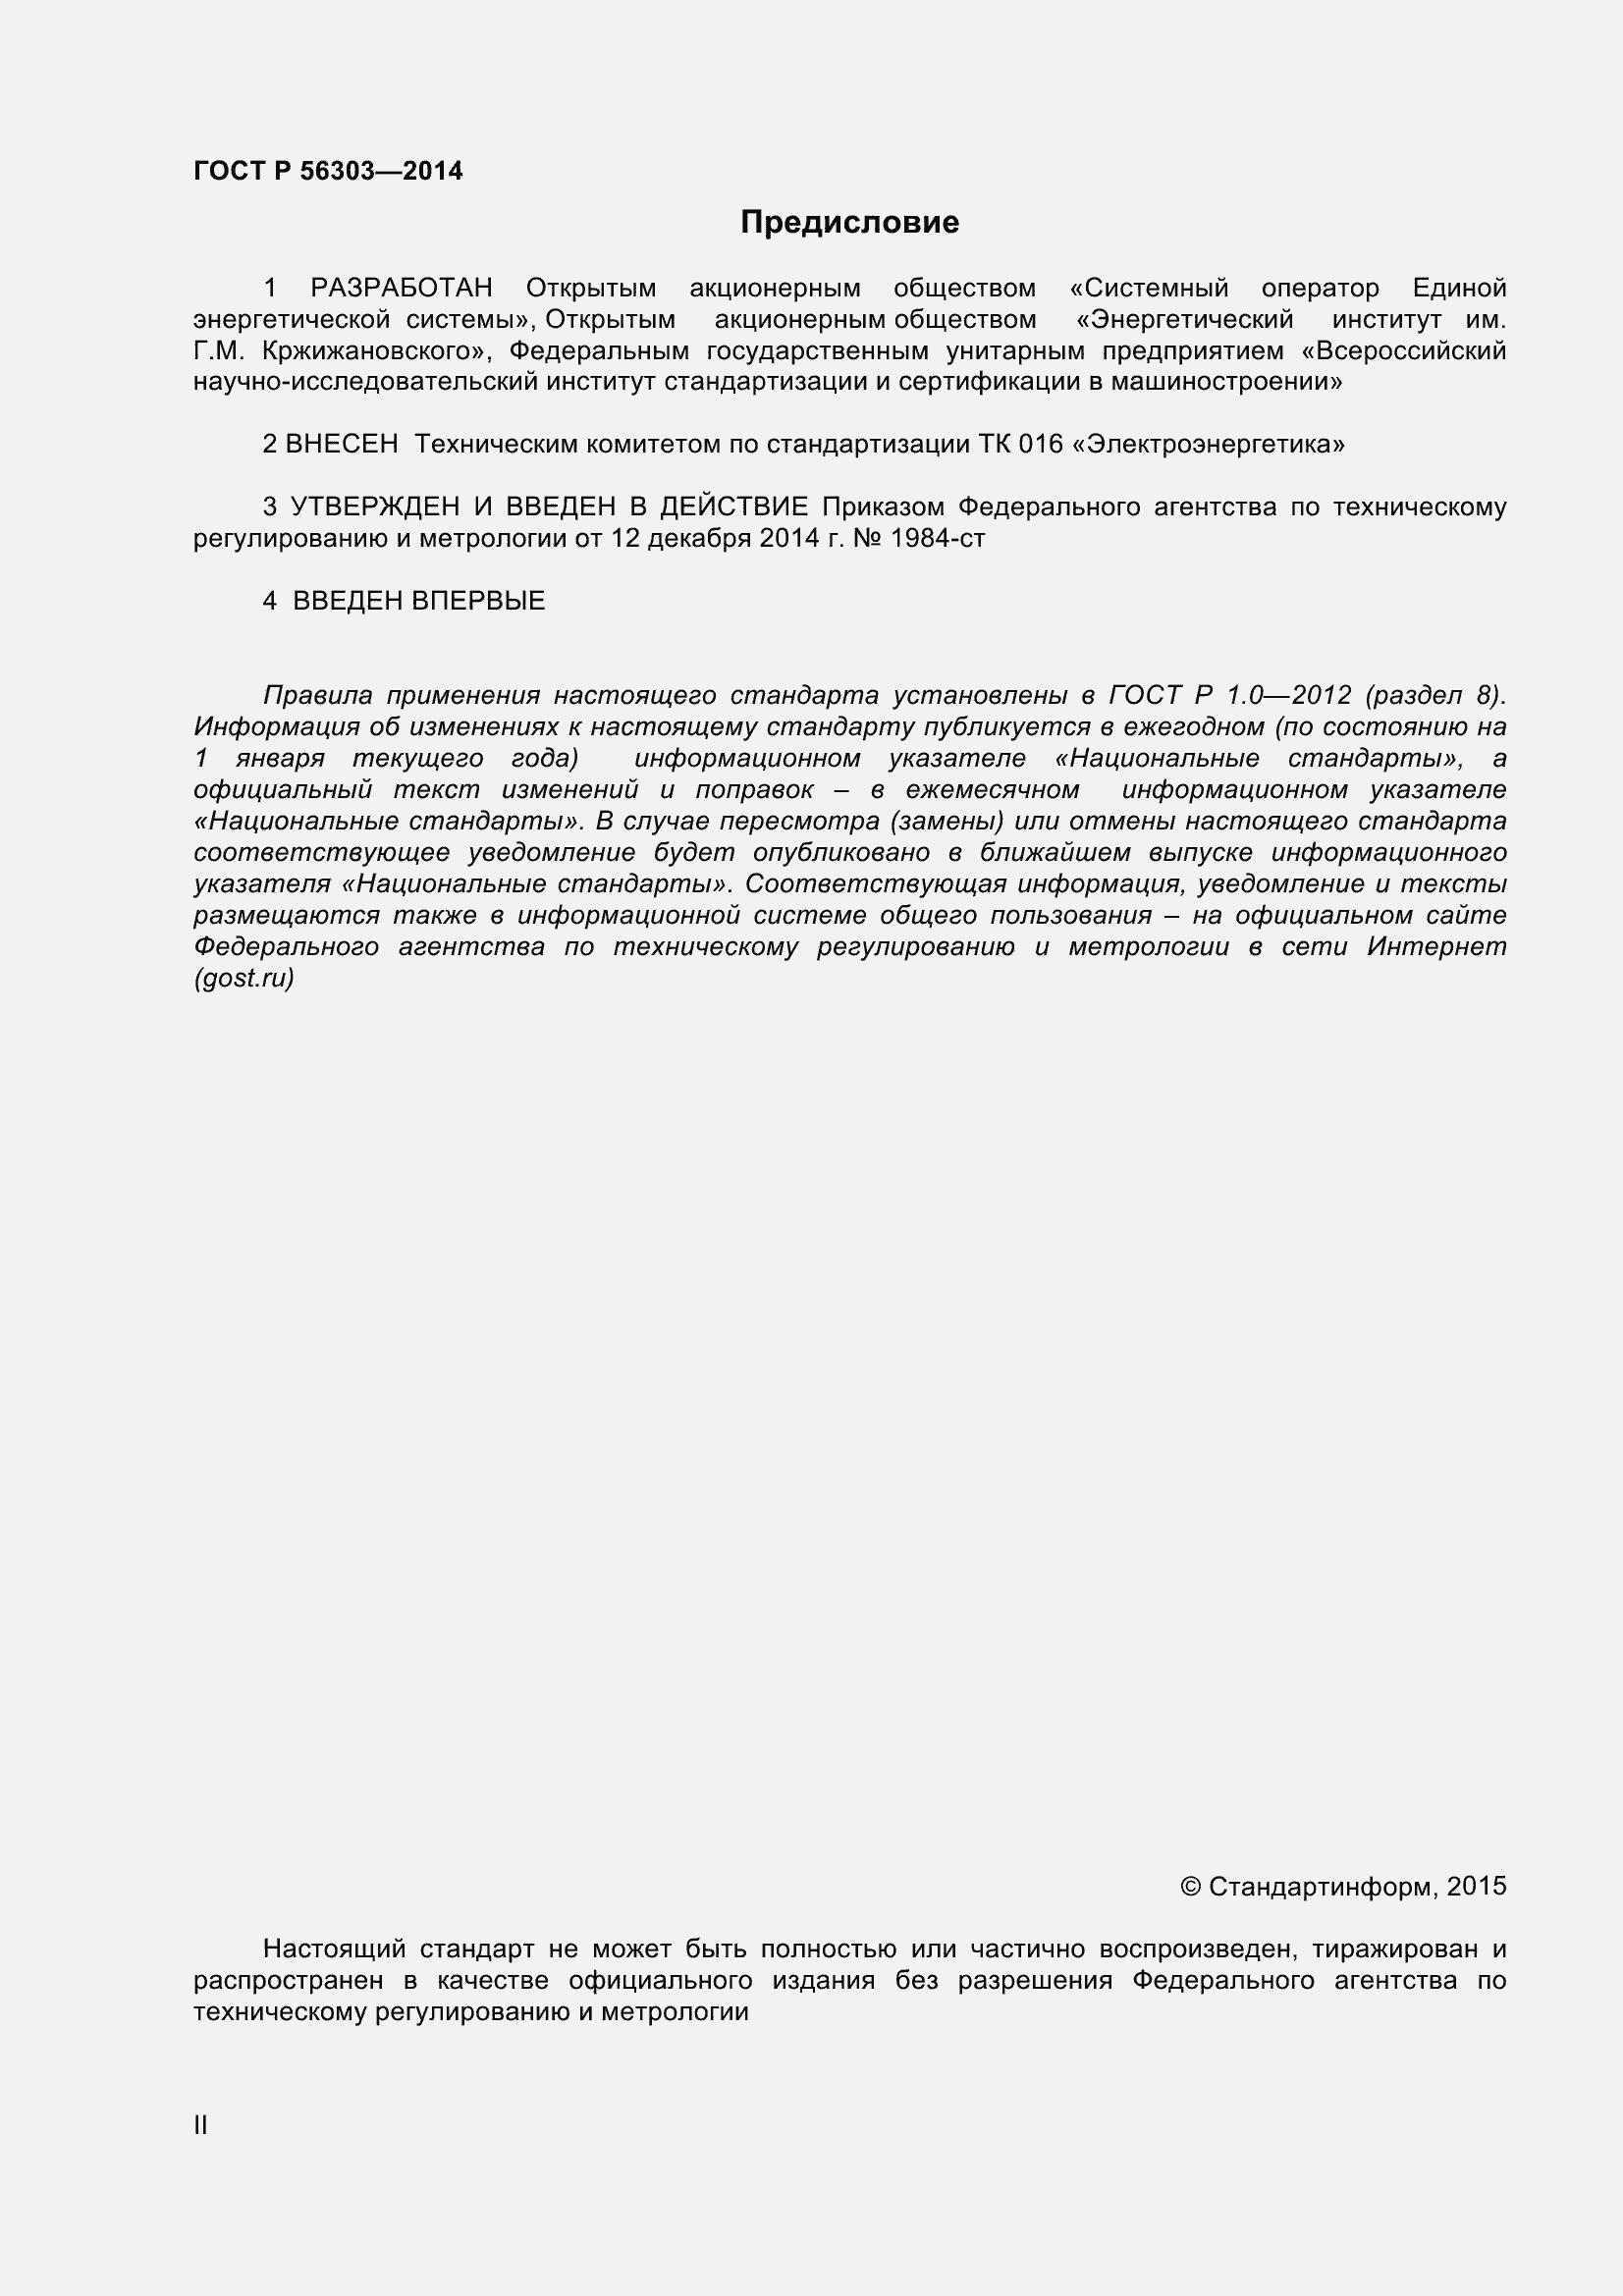 ГОСТ Р 56303-2014. Страница 2